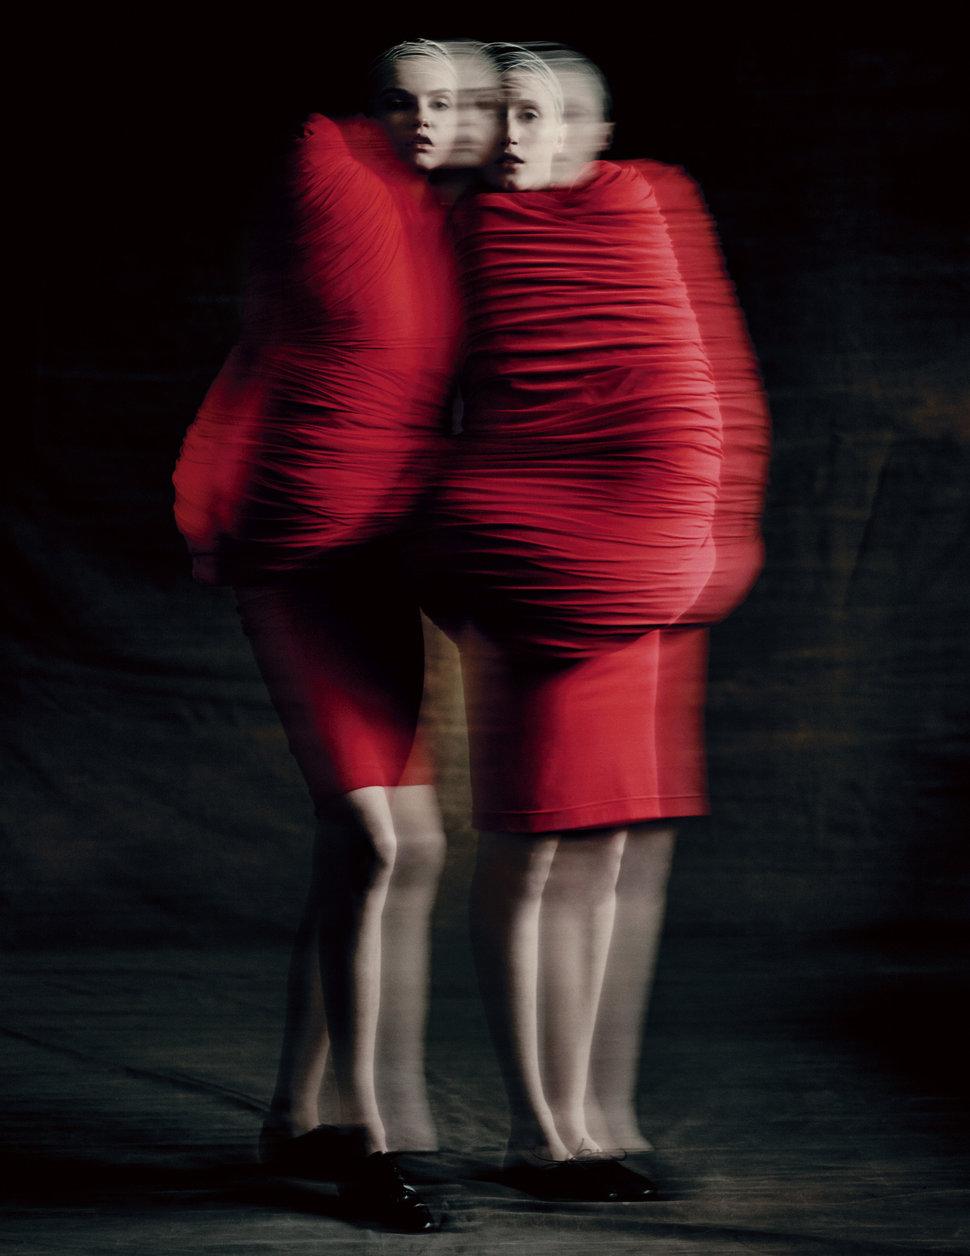 rei-kawakubo-Body-Meets-Dress–Dress-Meets-Body